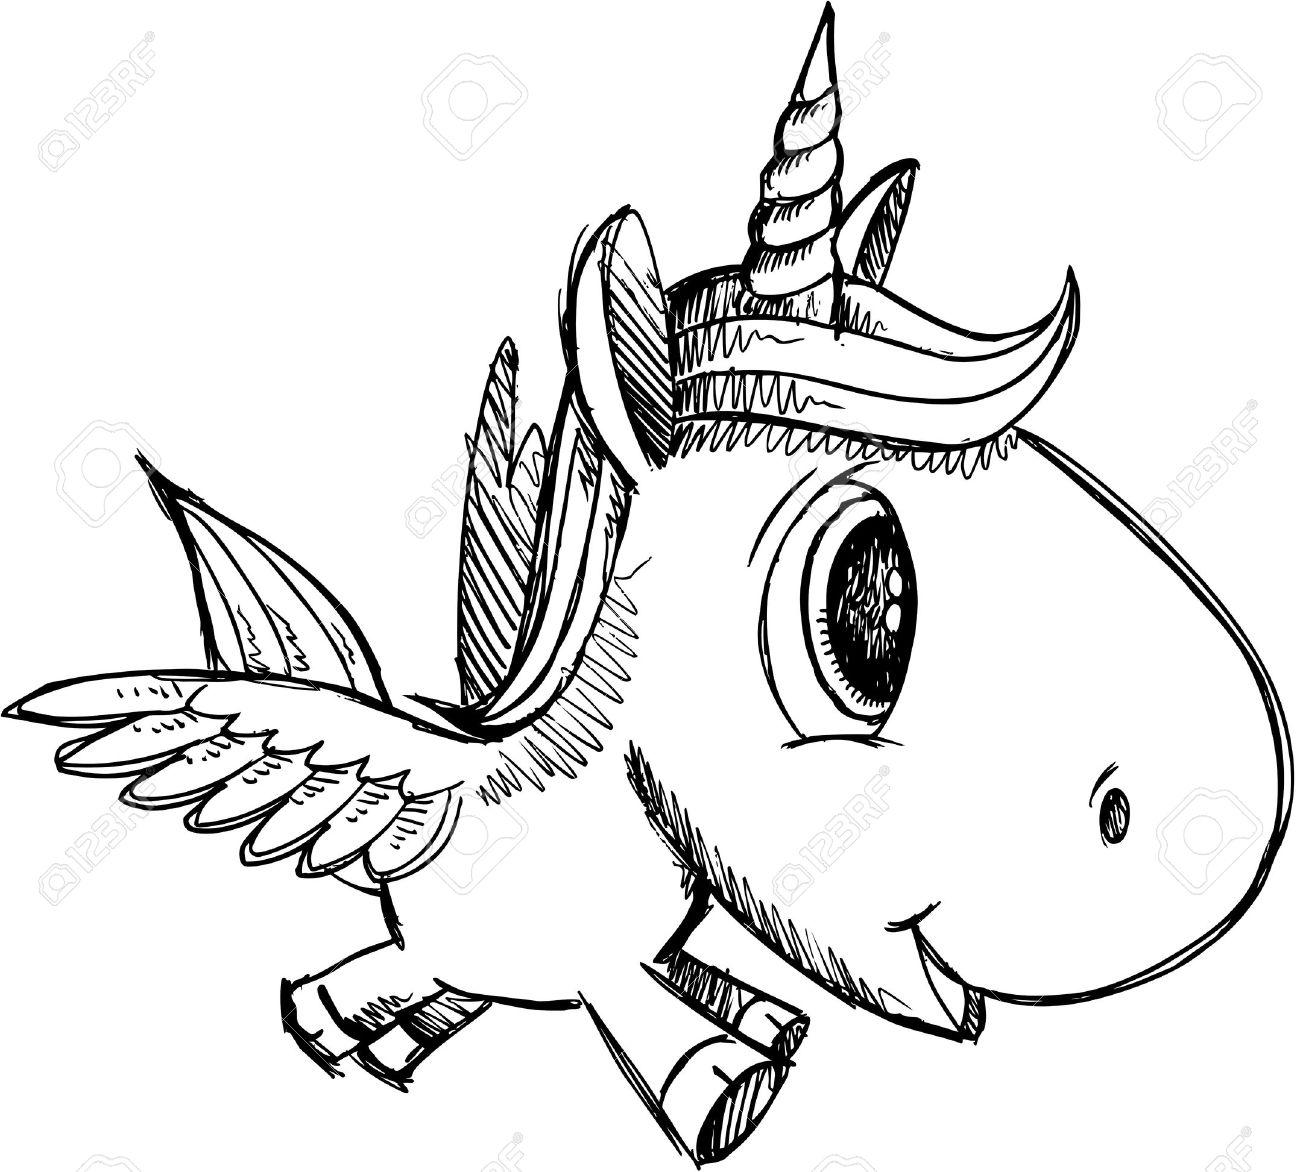 Sketch Doodle Unicorn Pegasus Alicorn Art - 18528883